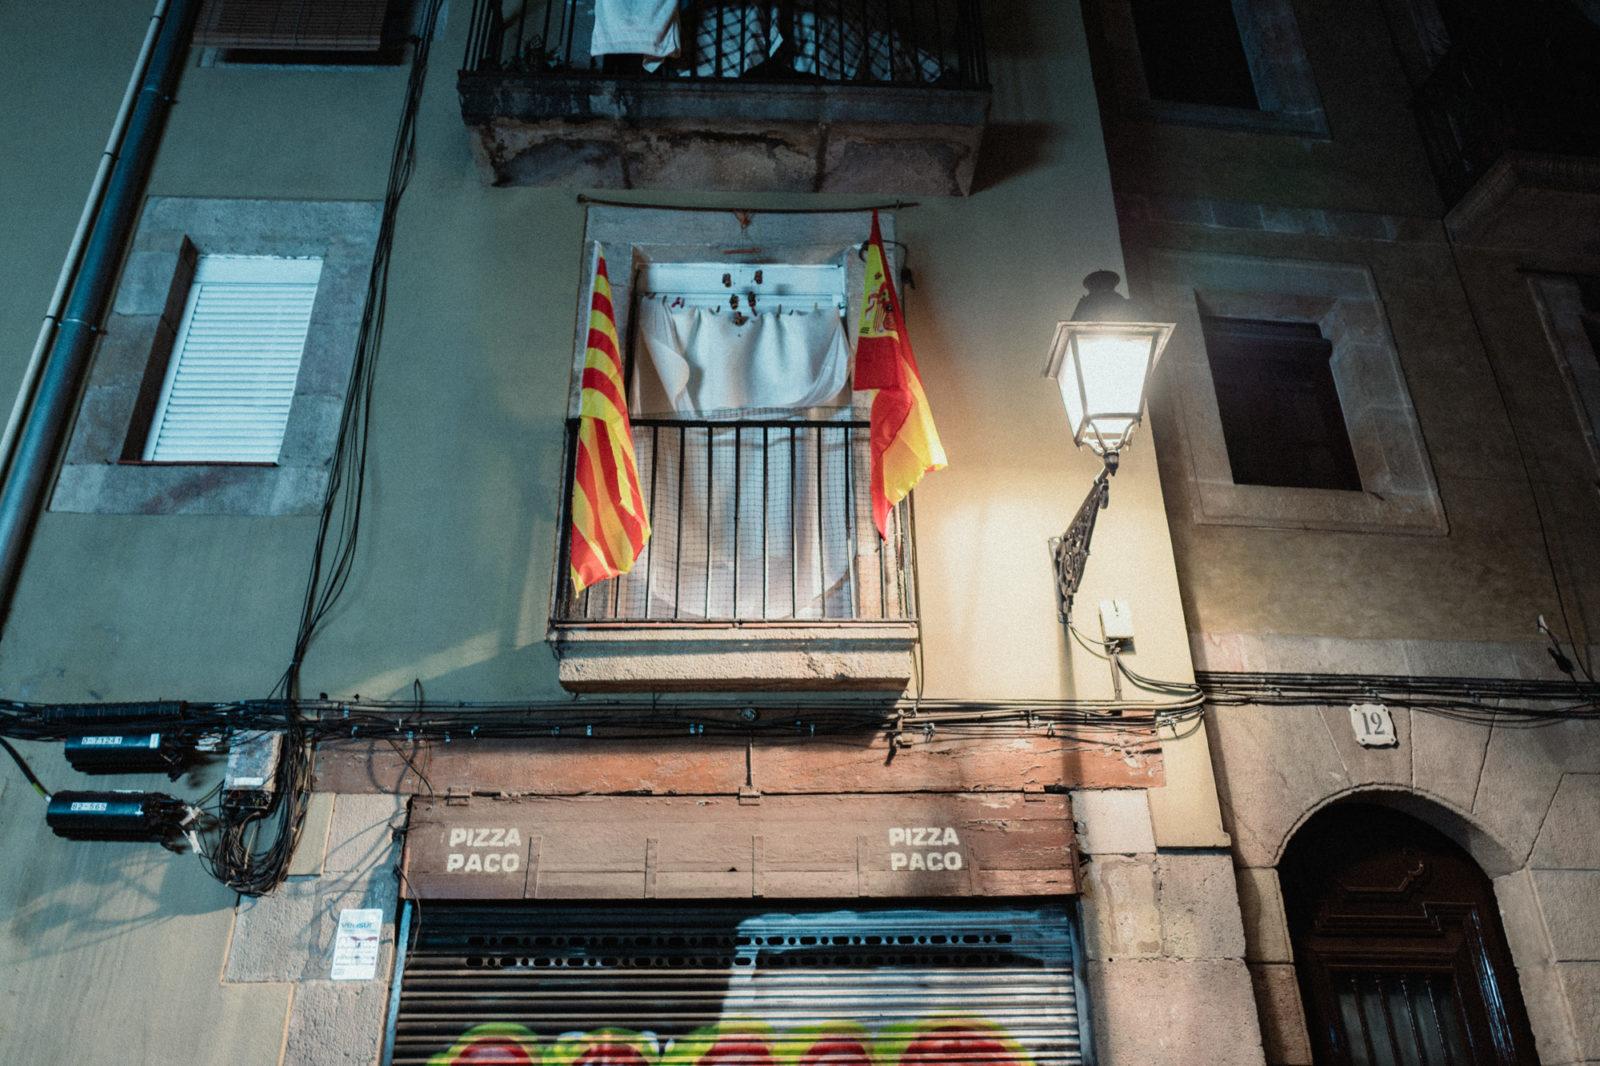 Barcelona Street-1090693